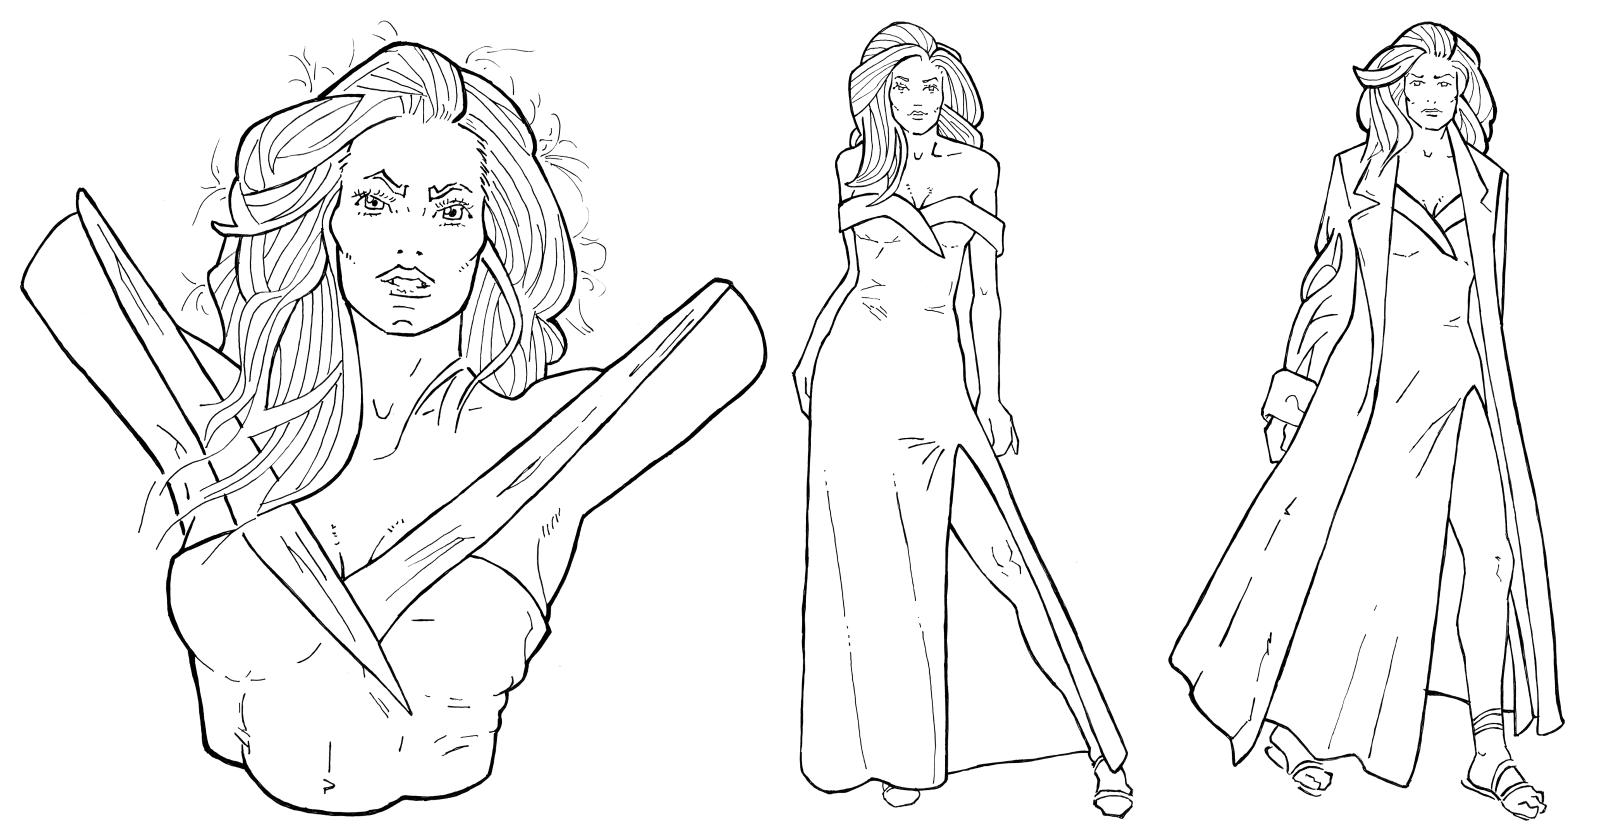 Character design for Linda